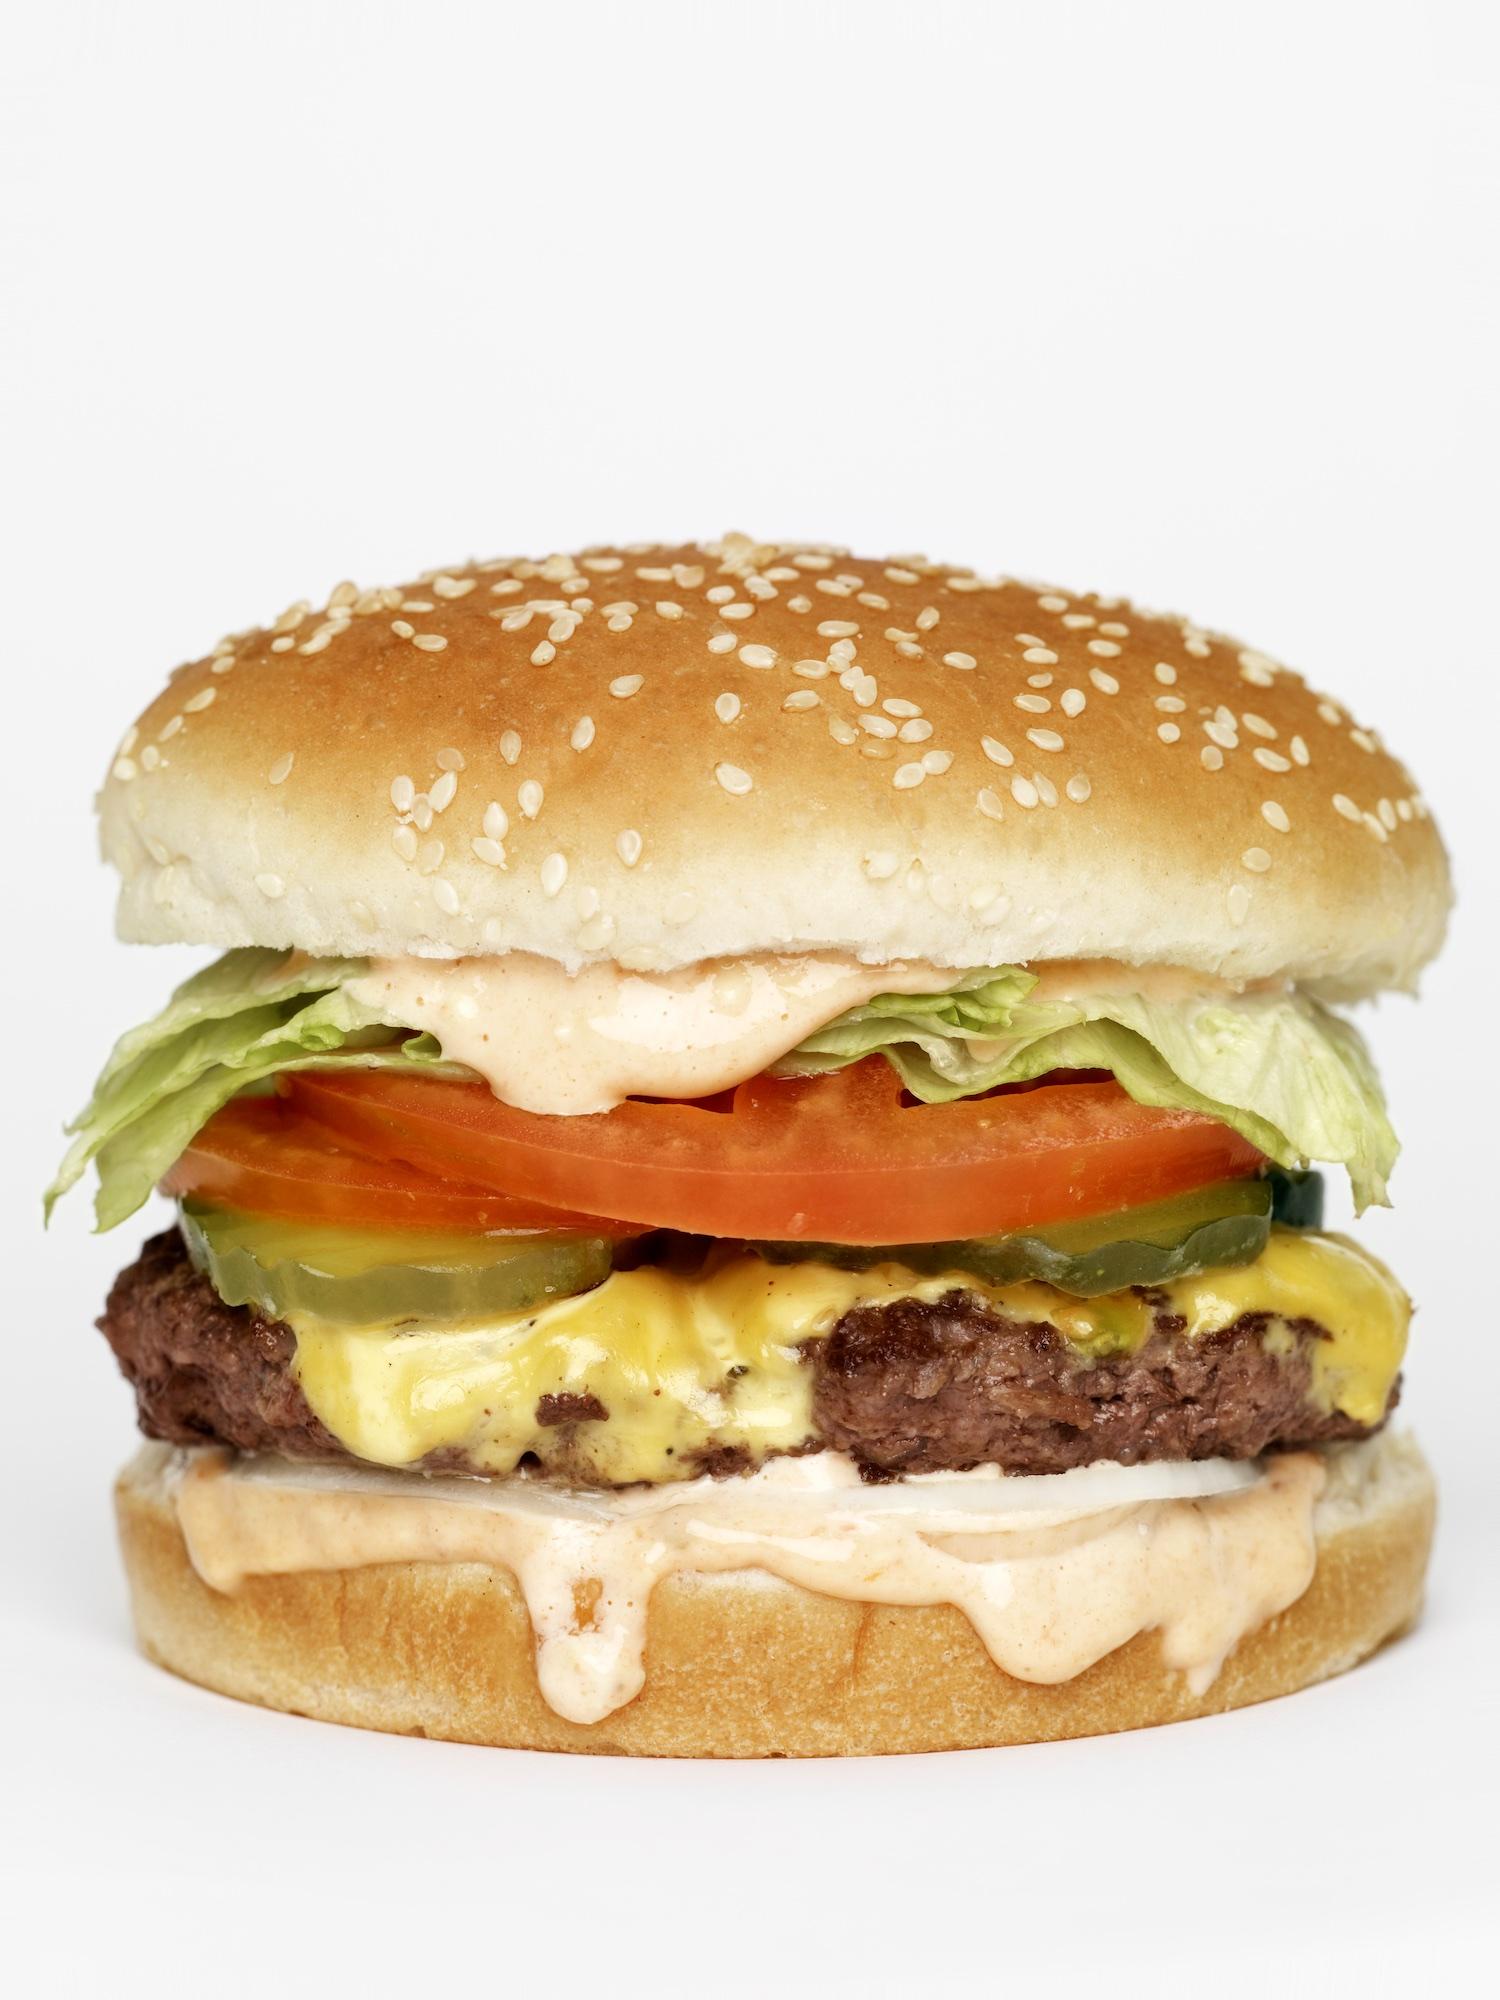 Jeff_Vespa_Oinkster_Cheeseburger.jpg